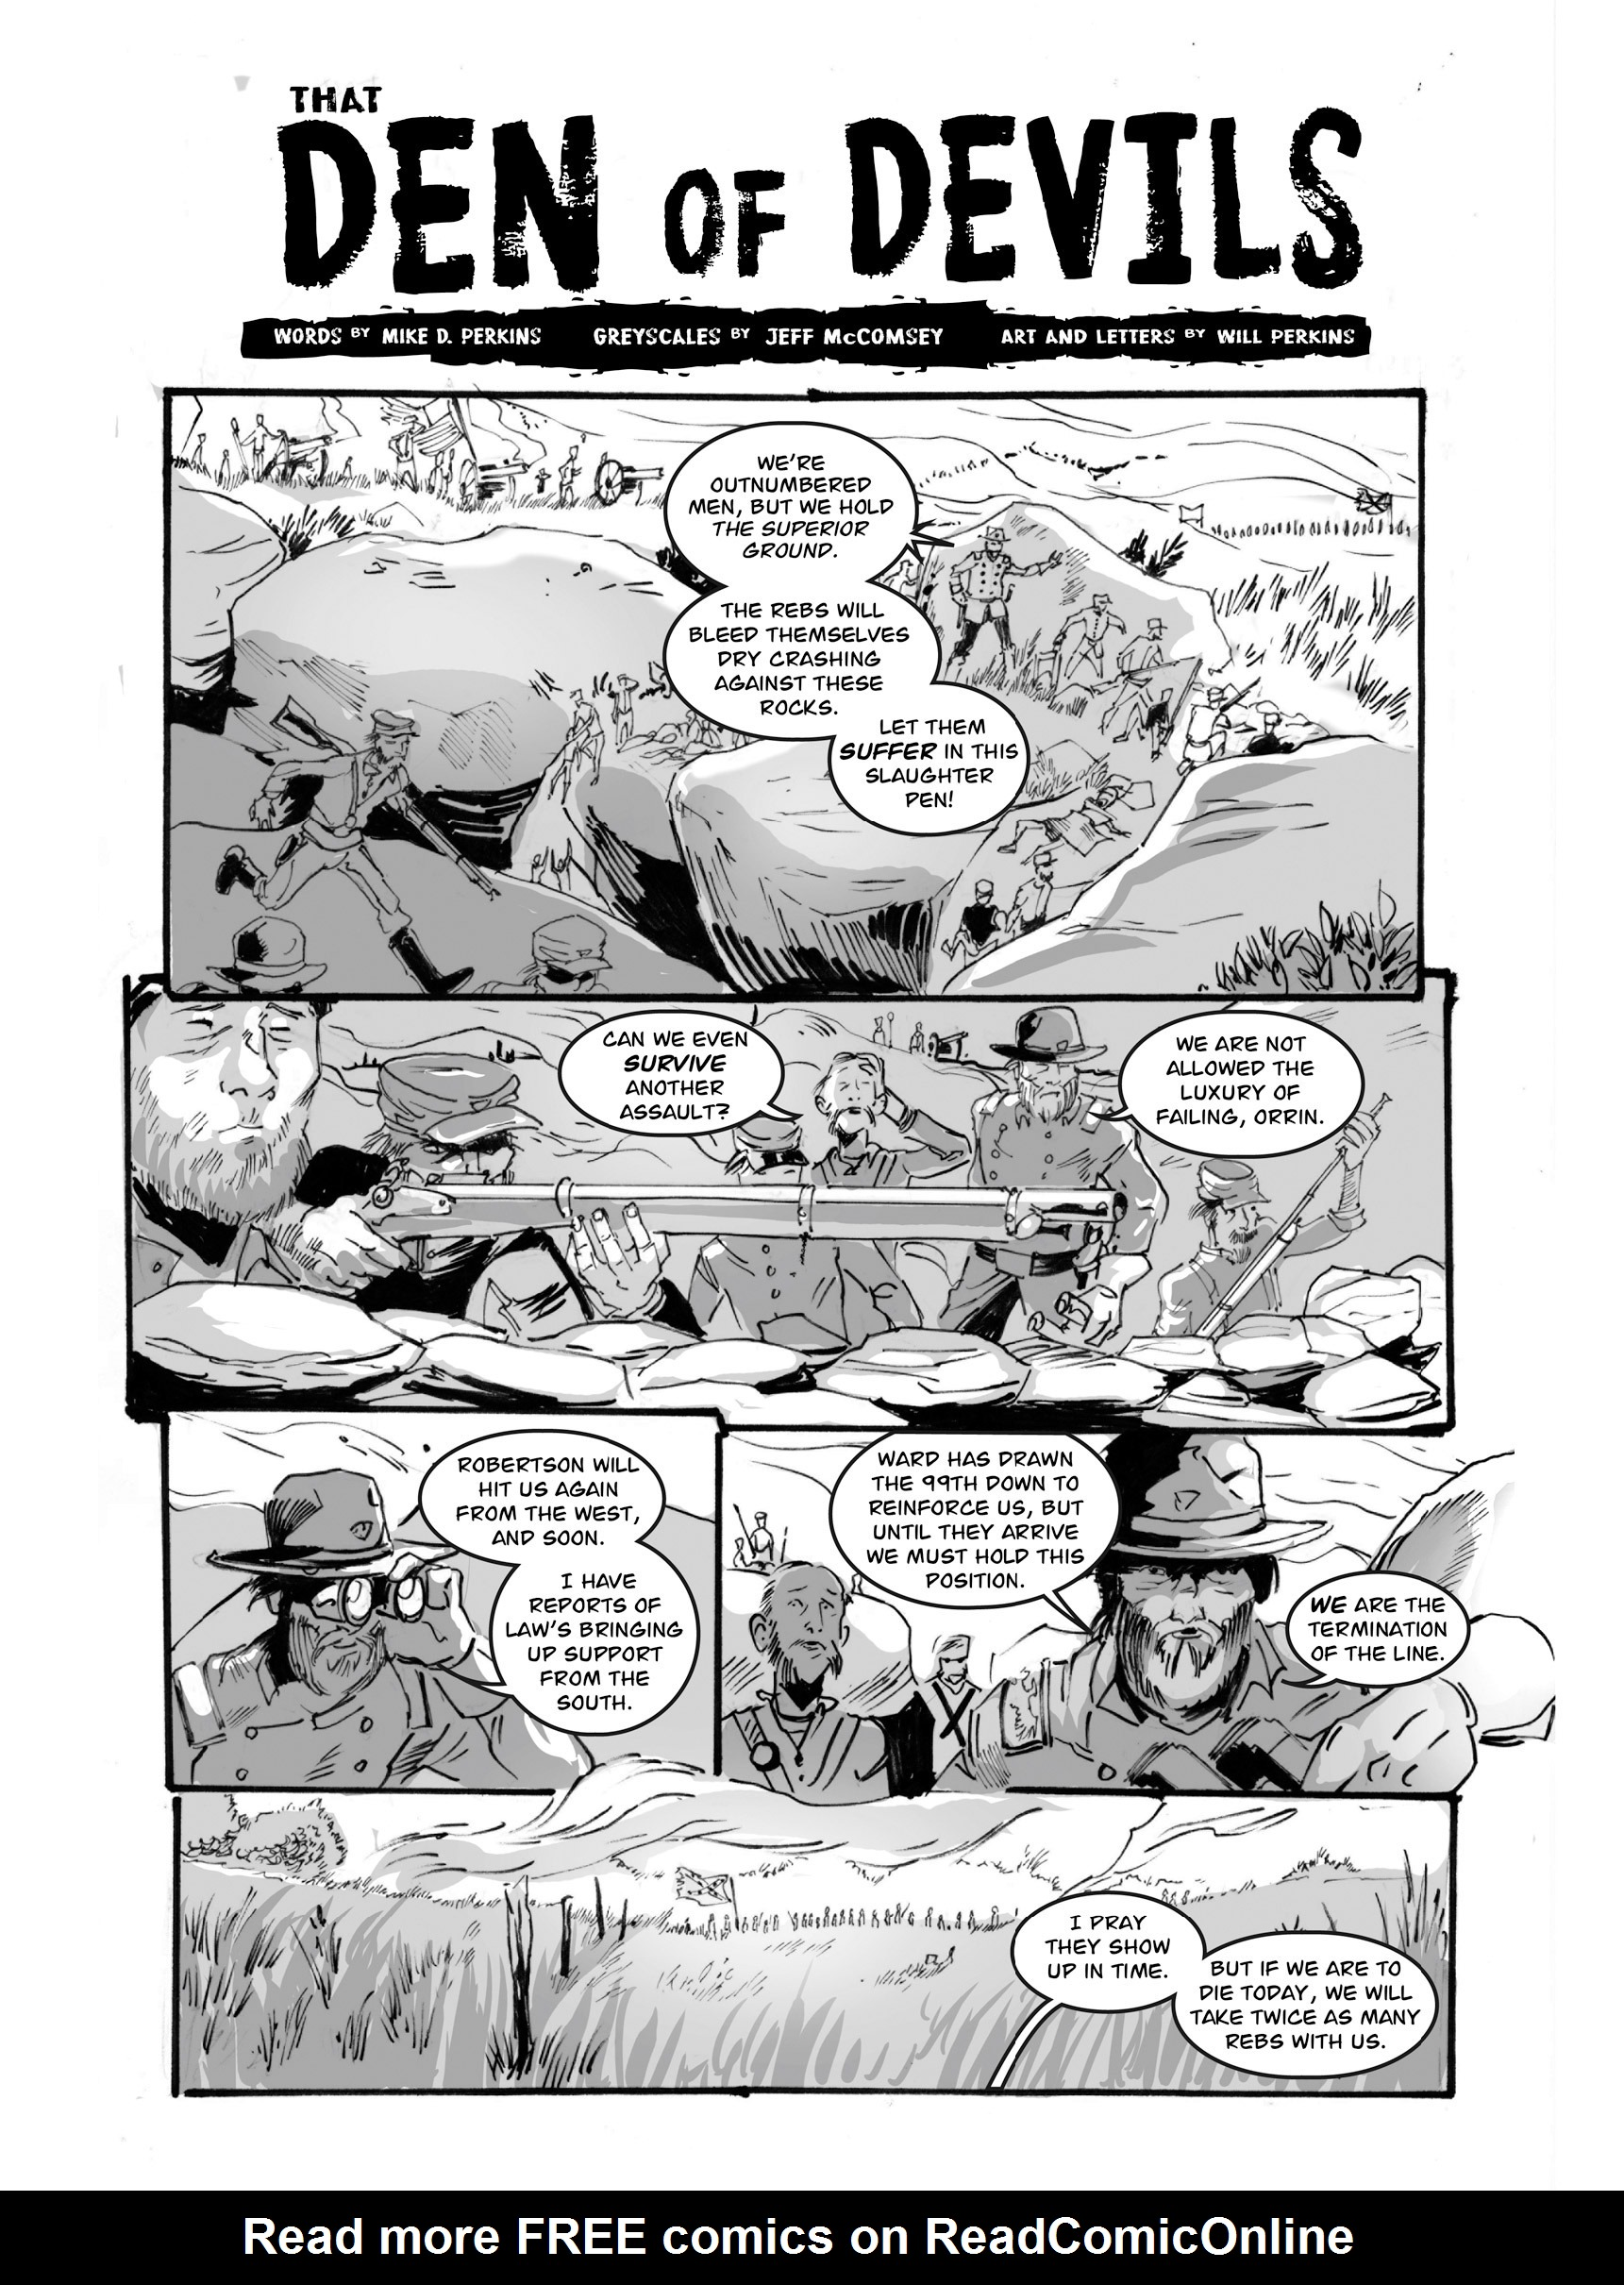 Read online FUBAR comic -  Issue #3 - 129